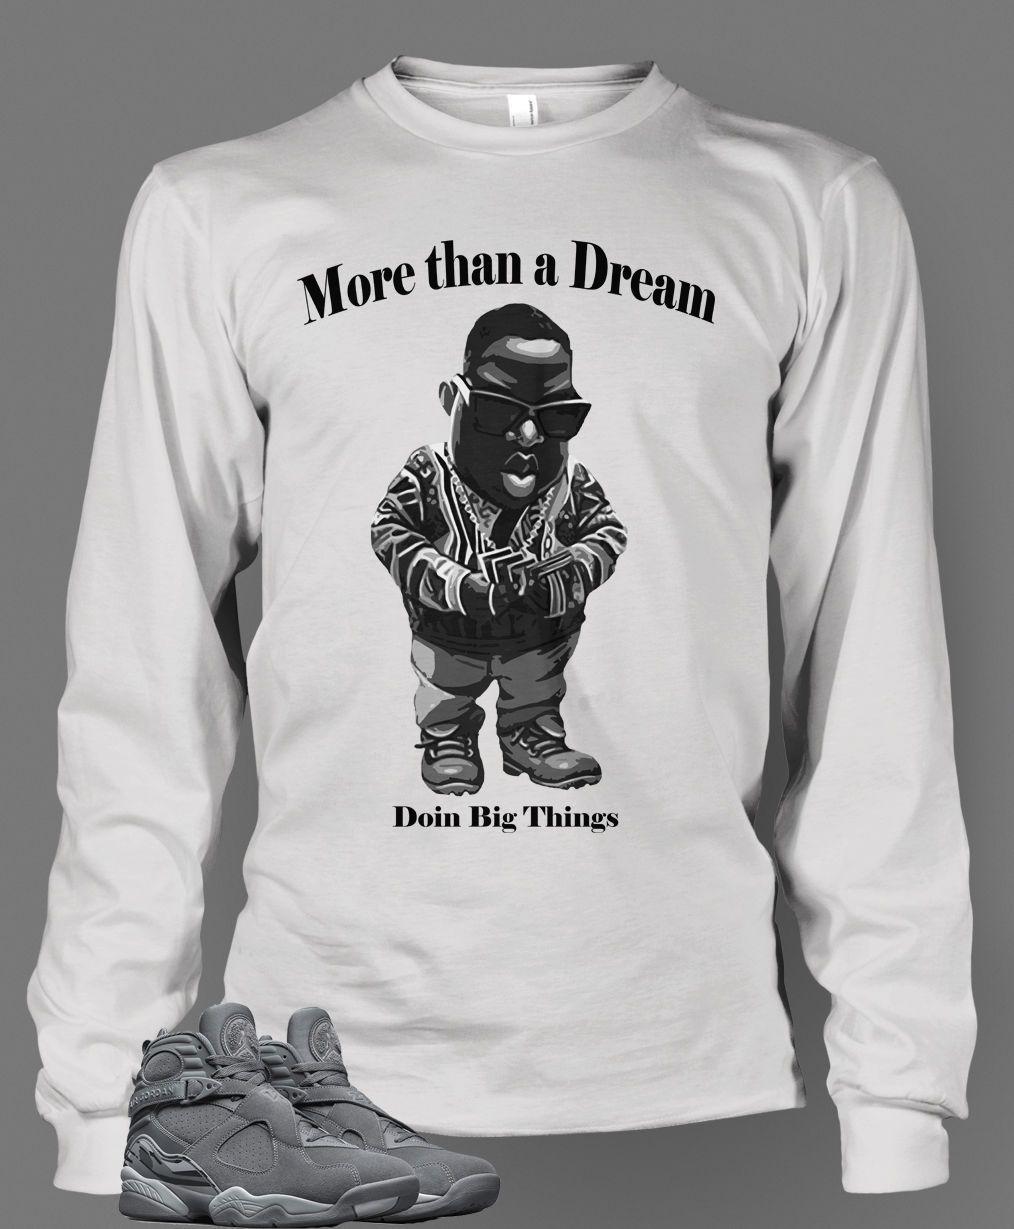 eb107ab82929c2 ... New Graphic Doing Big Thing T Shirt To Match Retro Air Jordan 8 Cool  Gray Shoe ...